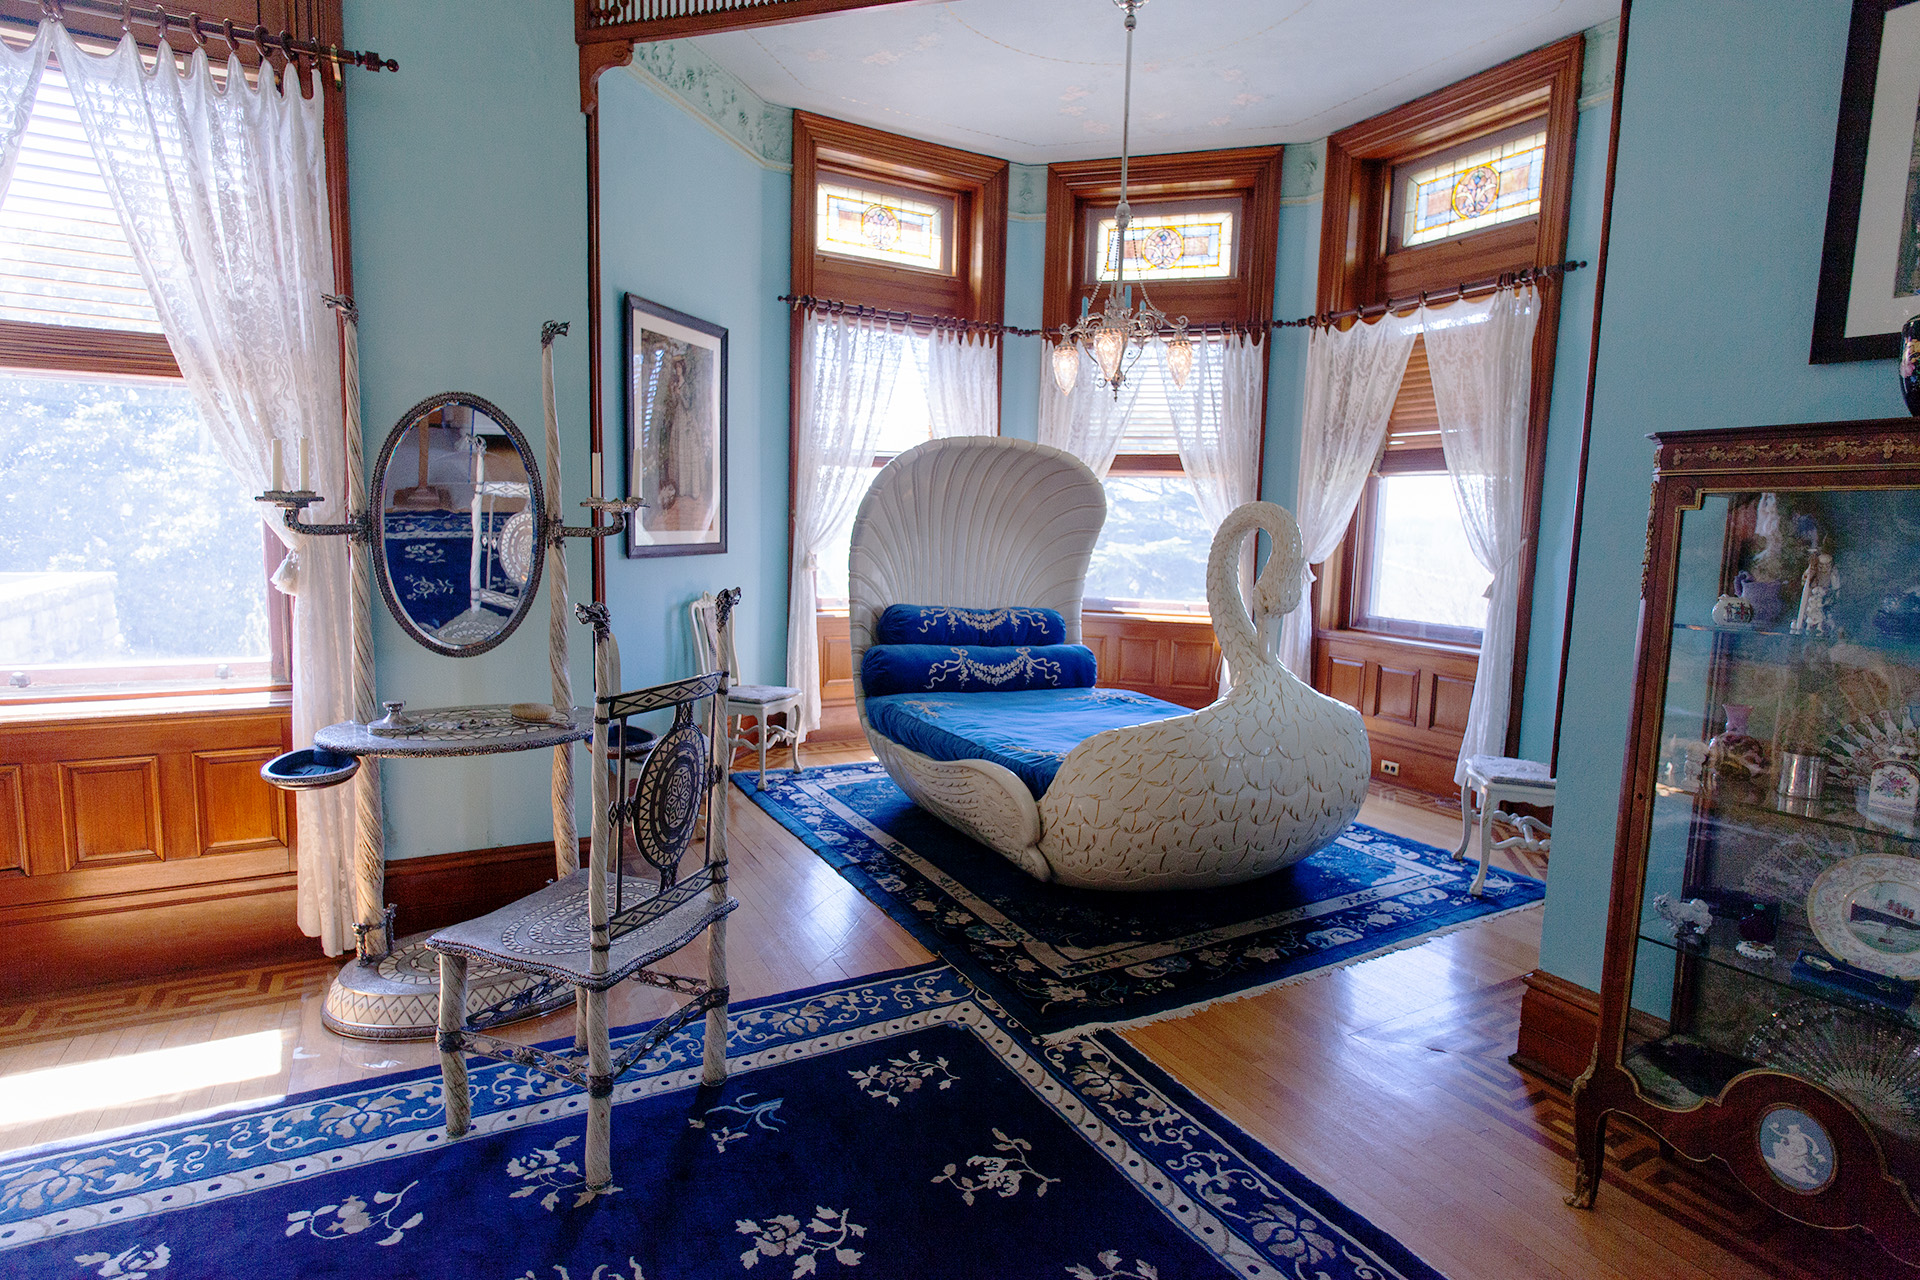 Mrs Dooley's Bedroom at Maymont Mansion